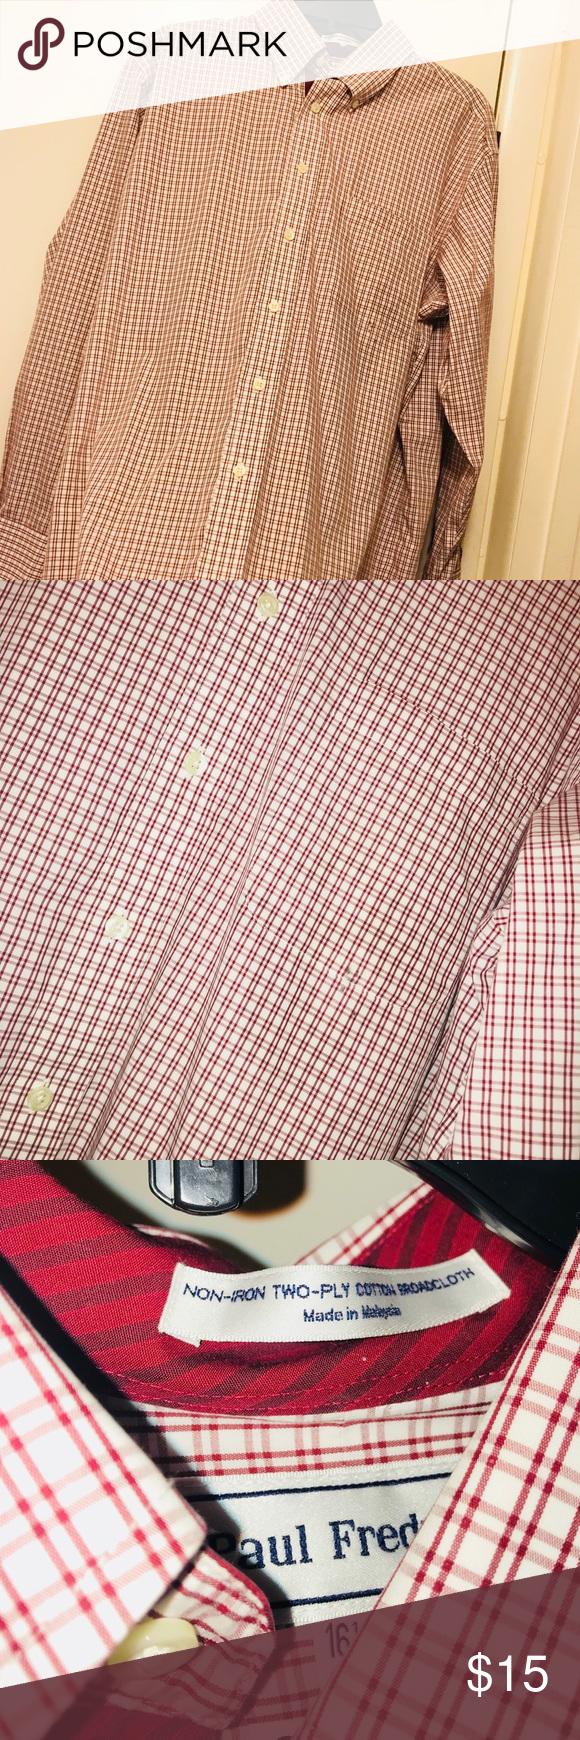 3 Bundle Deal Only! Nice Dress Shirt Sz16.533 (With